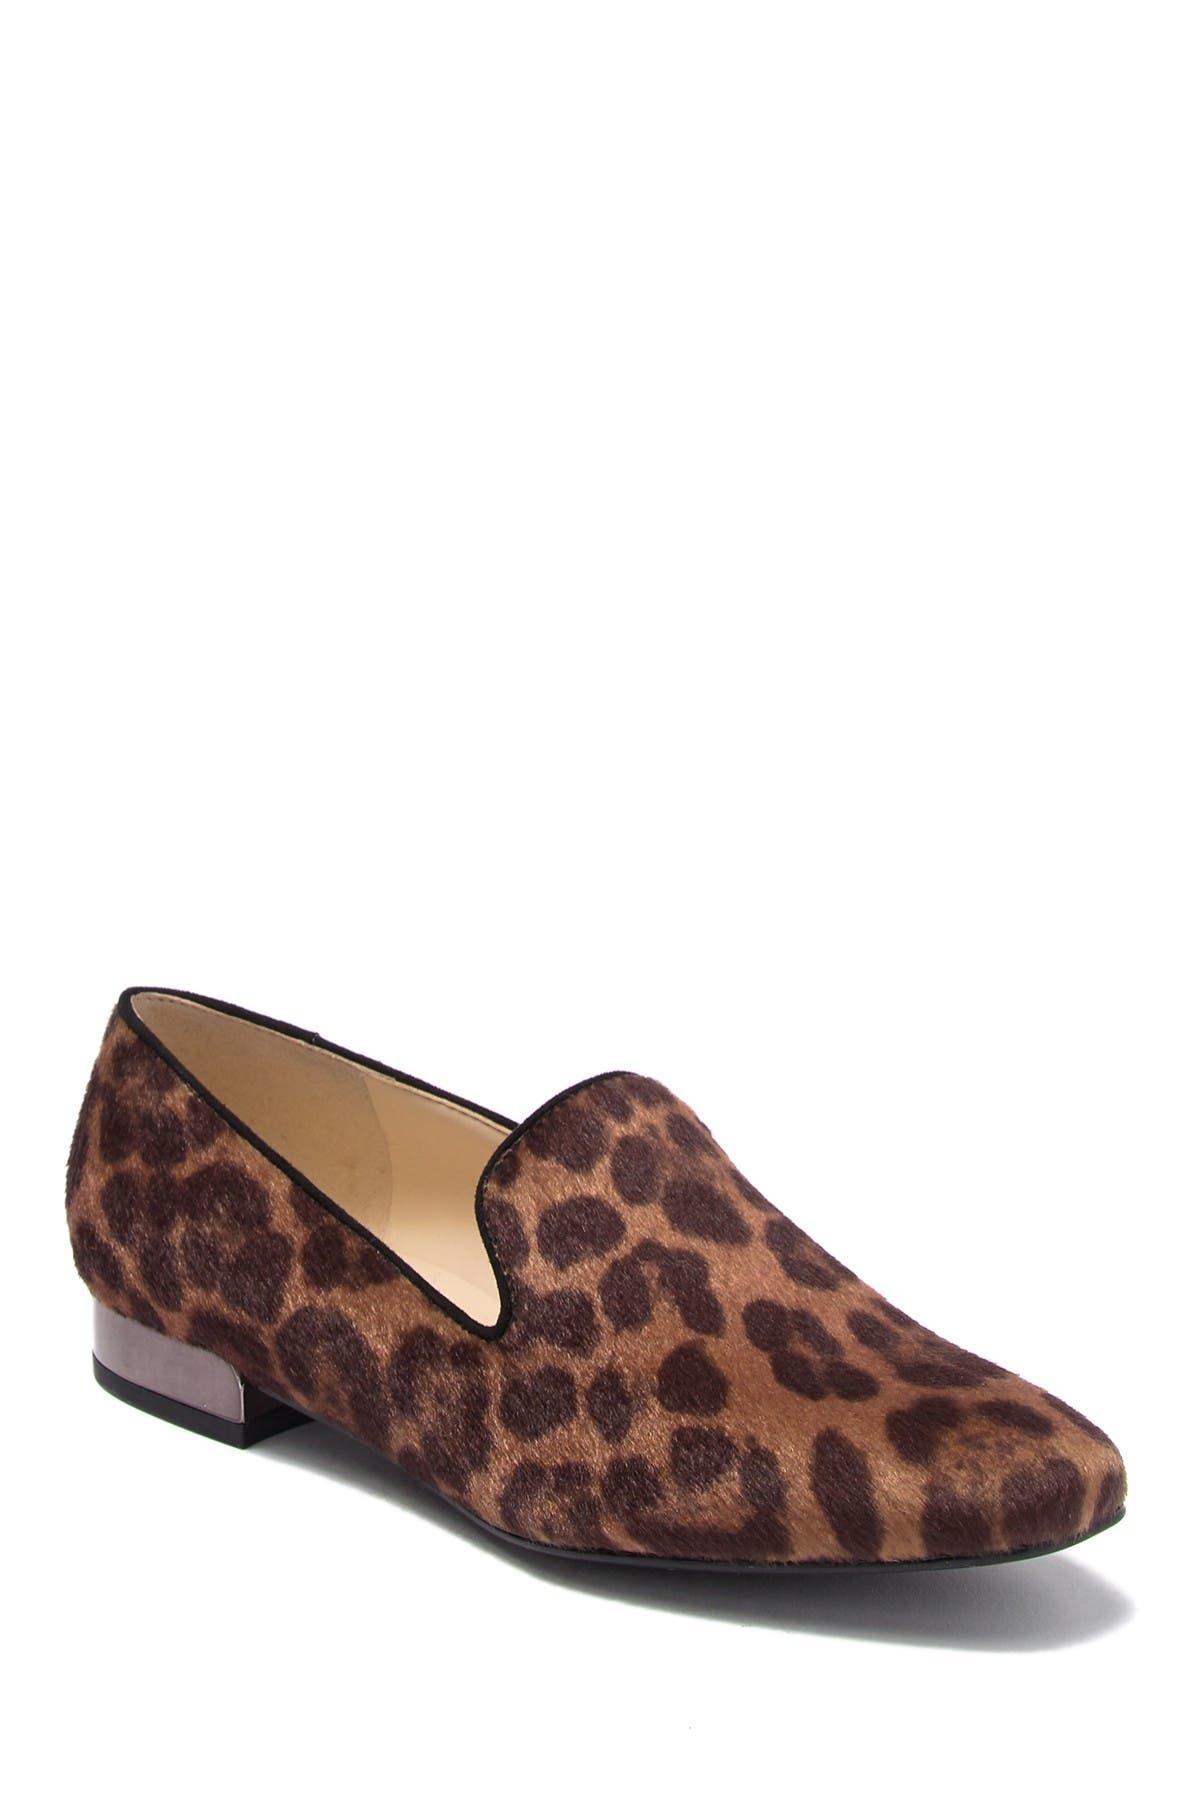 Lisette Faux Fur Leopard Print Loafer